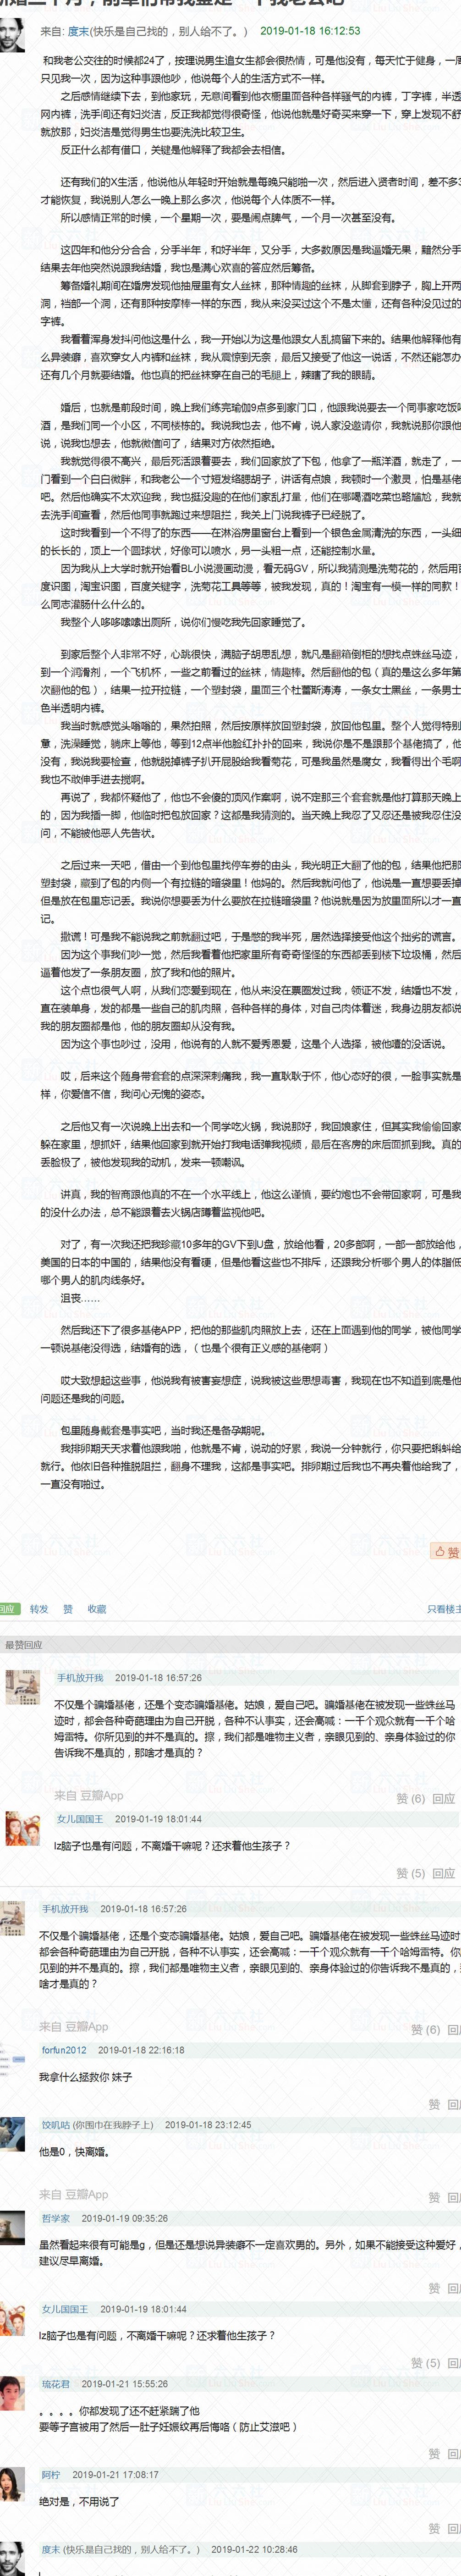 www.taoshu6.com_来自豆瓣:我该拿什么拯救你,我新婚的基佬老公 taoshu6.net淘书楼淘福利 第2张